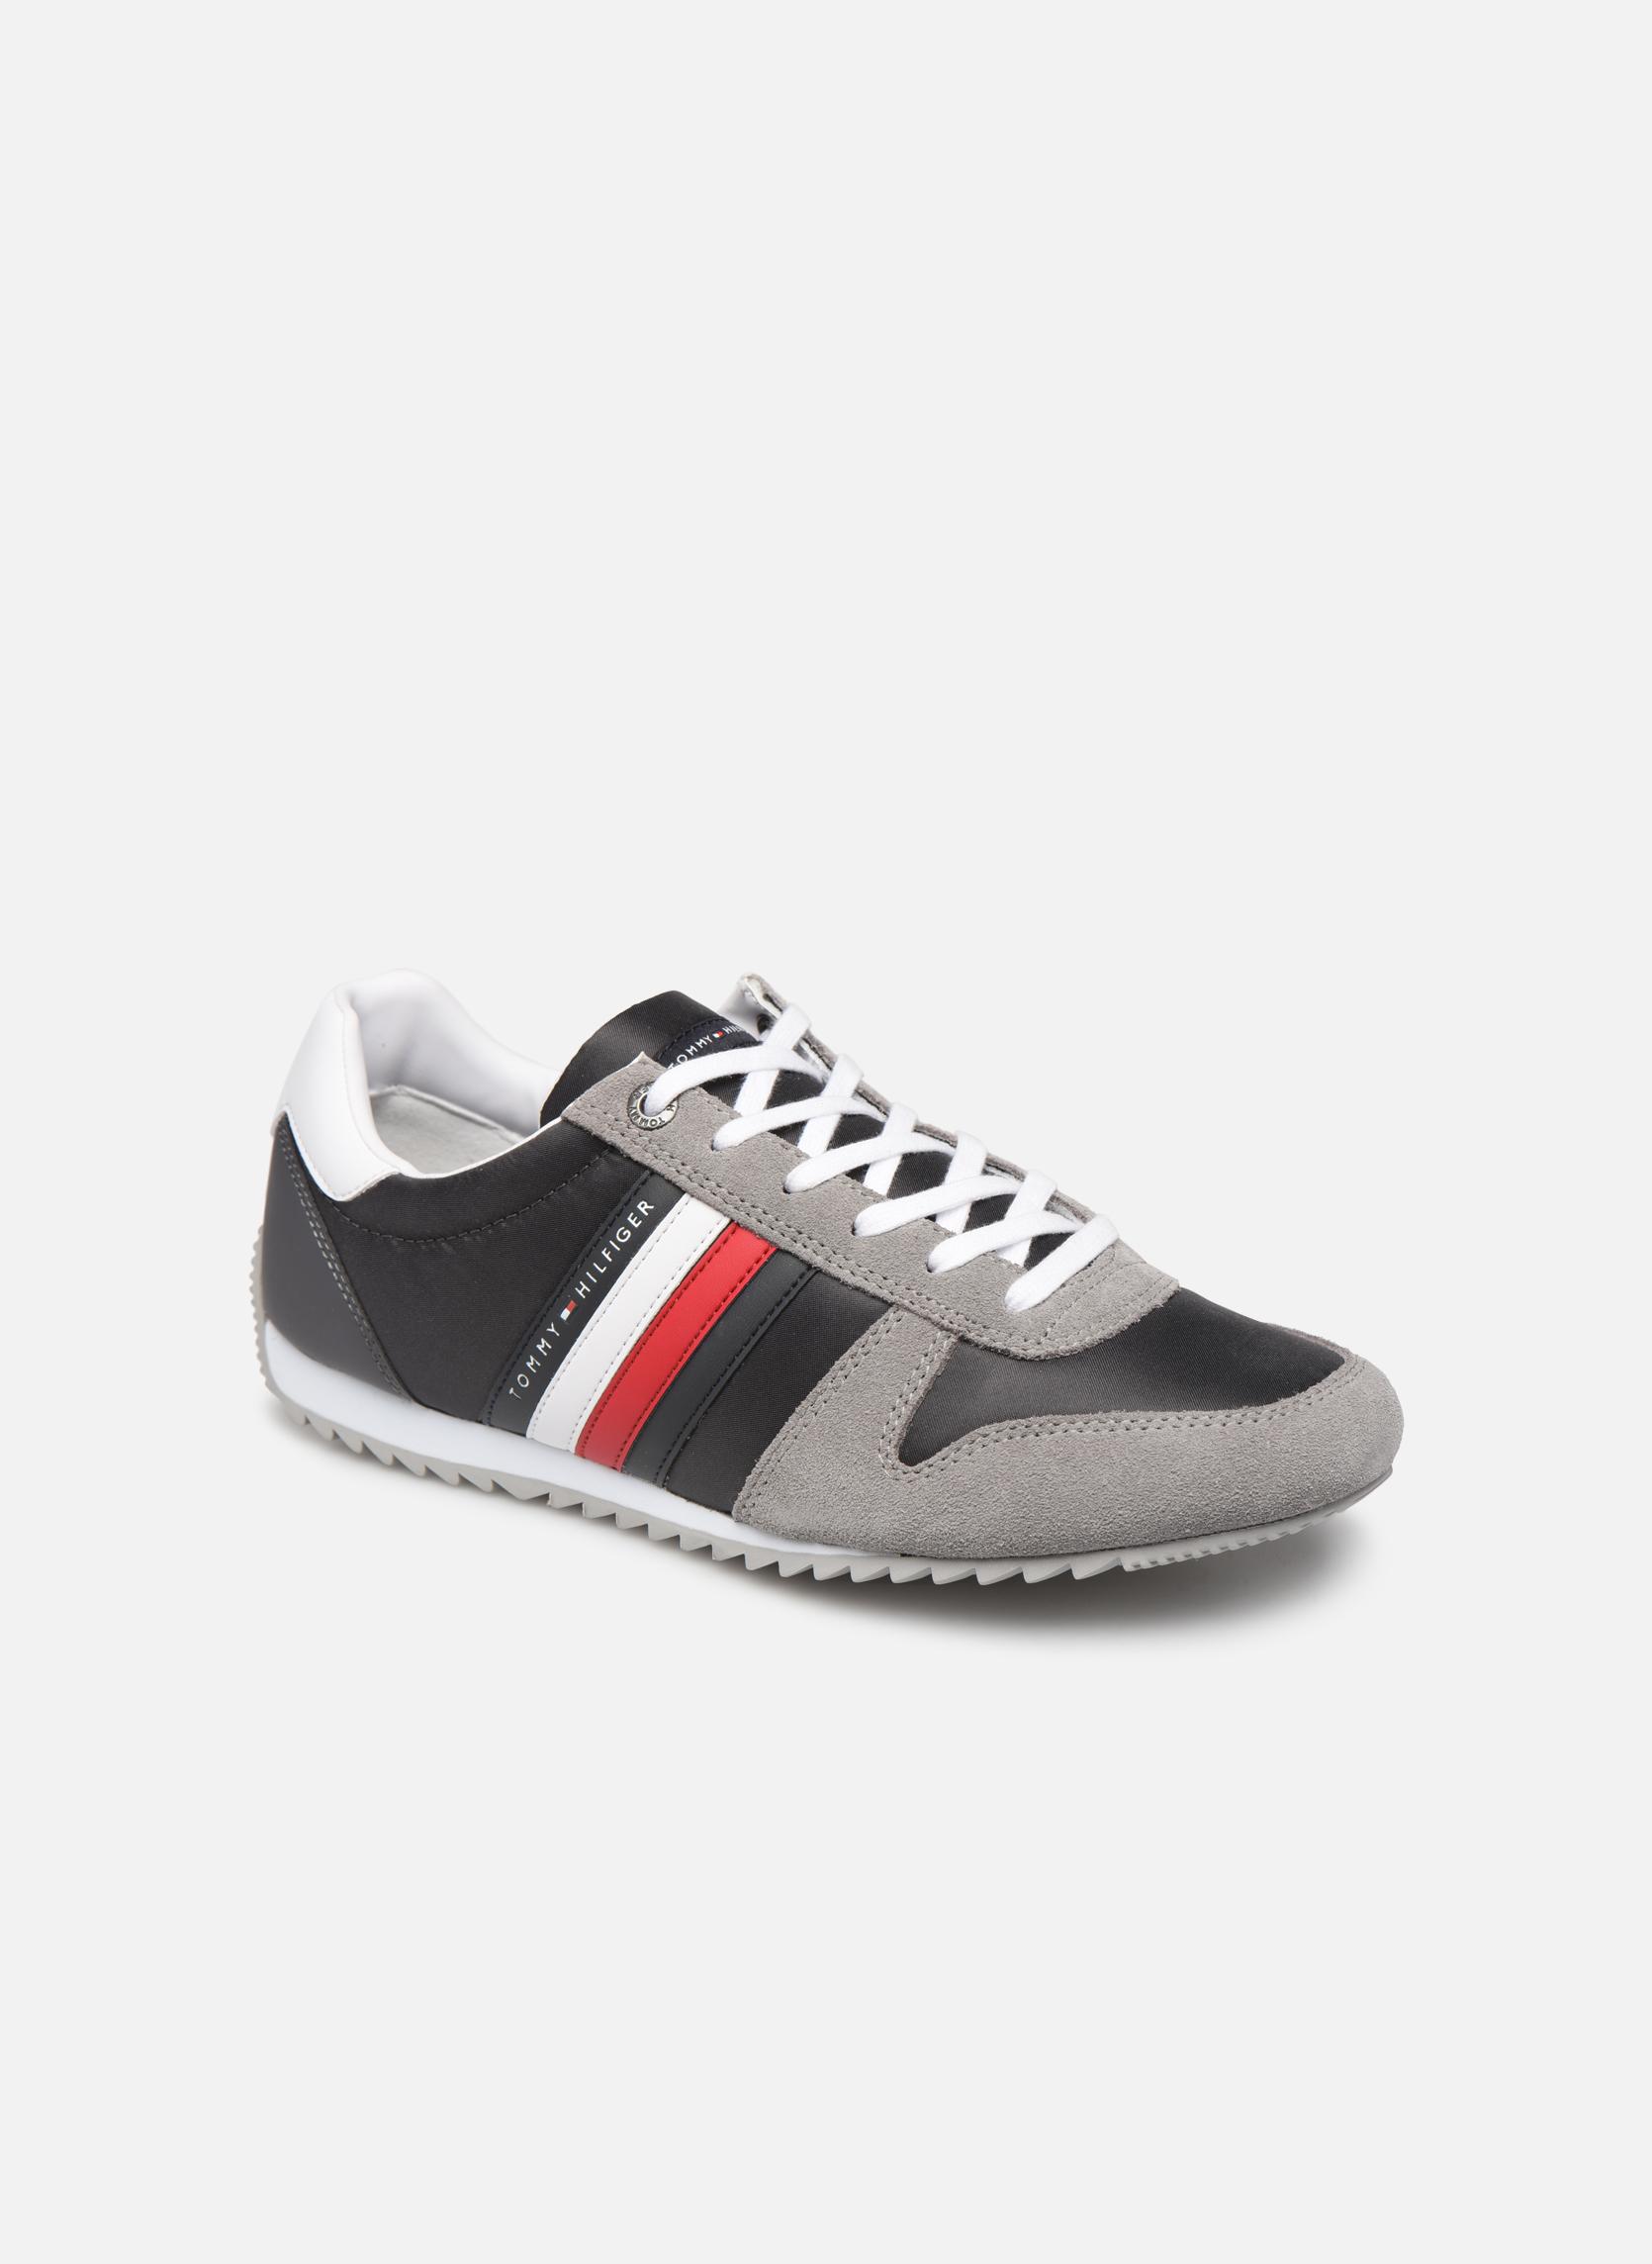 Sneakers Tommy Hilfiger Grijs